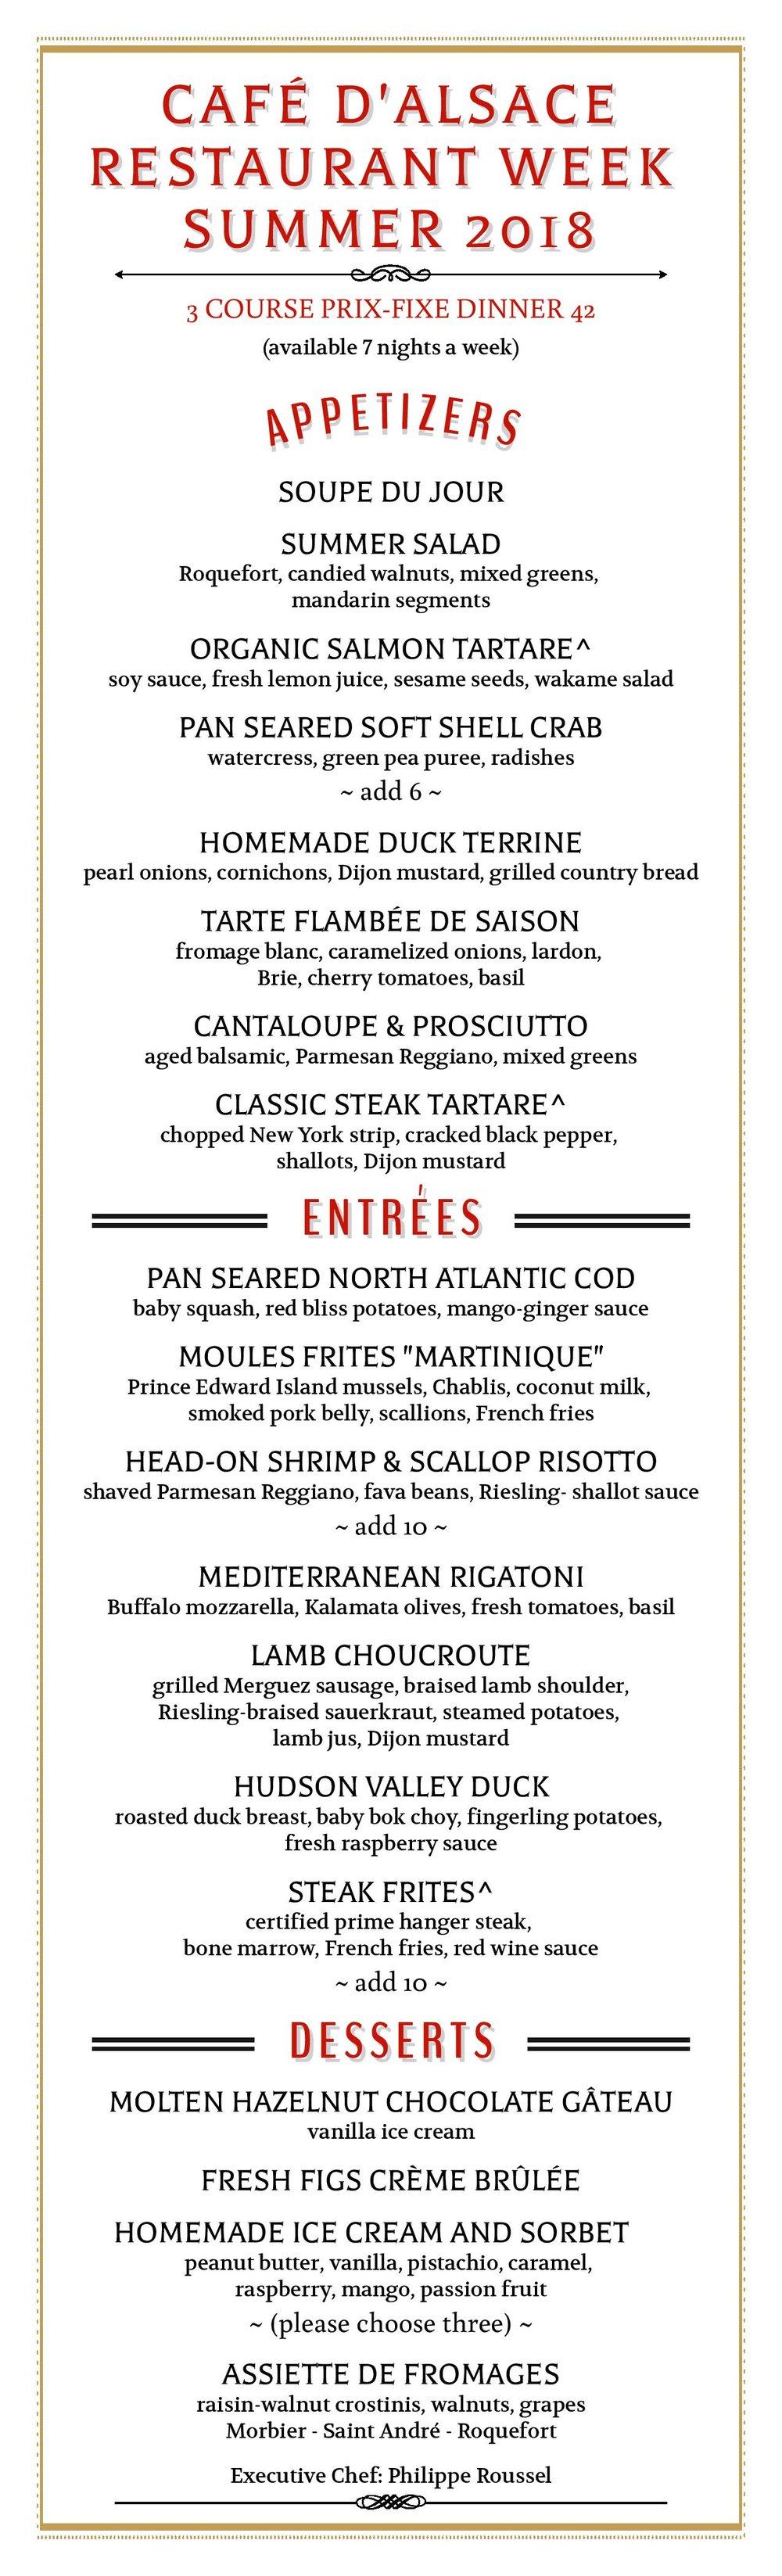 RW Dinner Prix Fixe Summer 2018-page-001.jpg